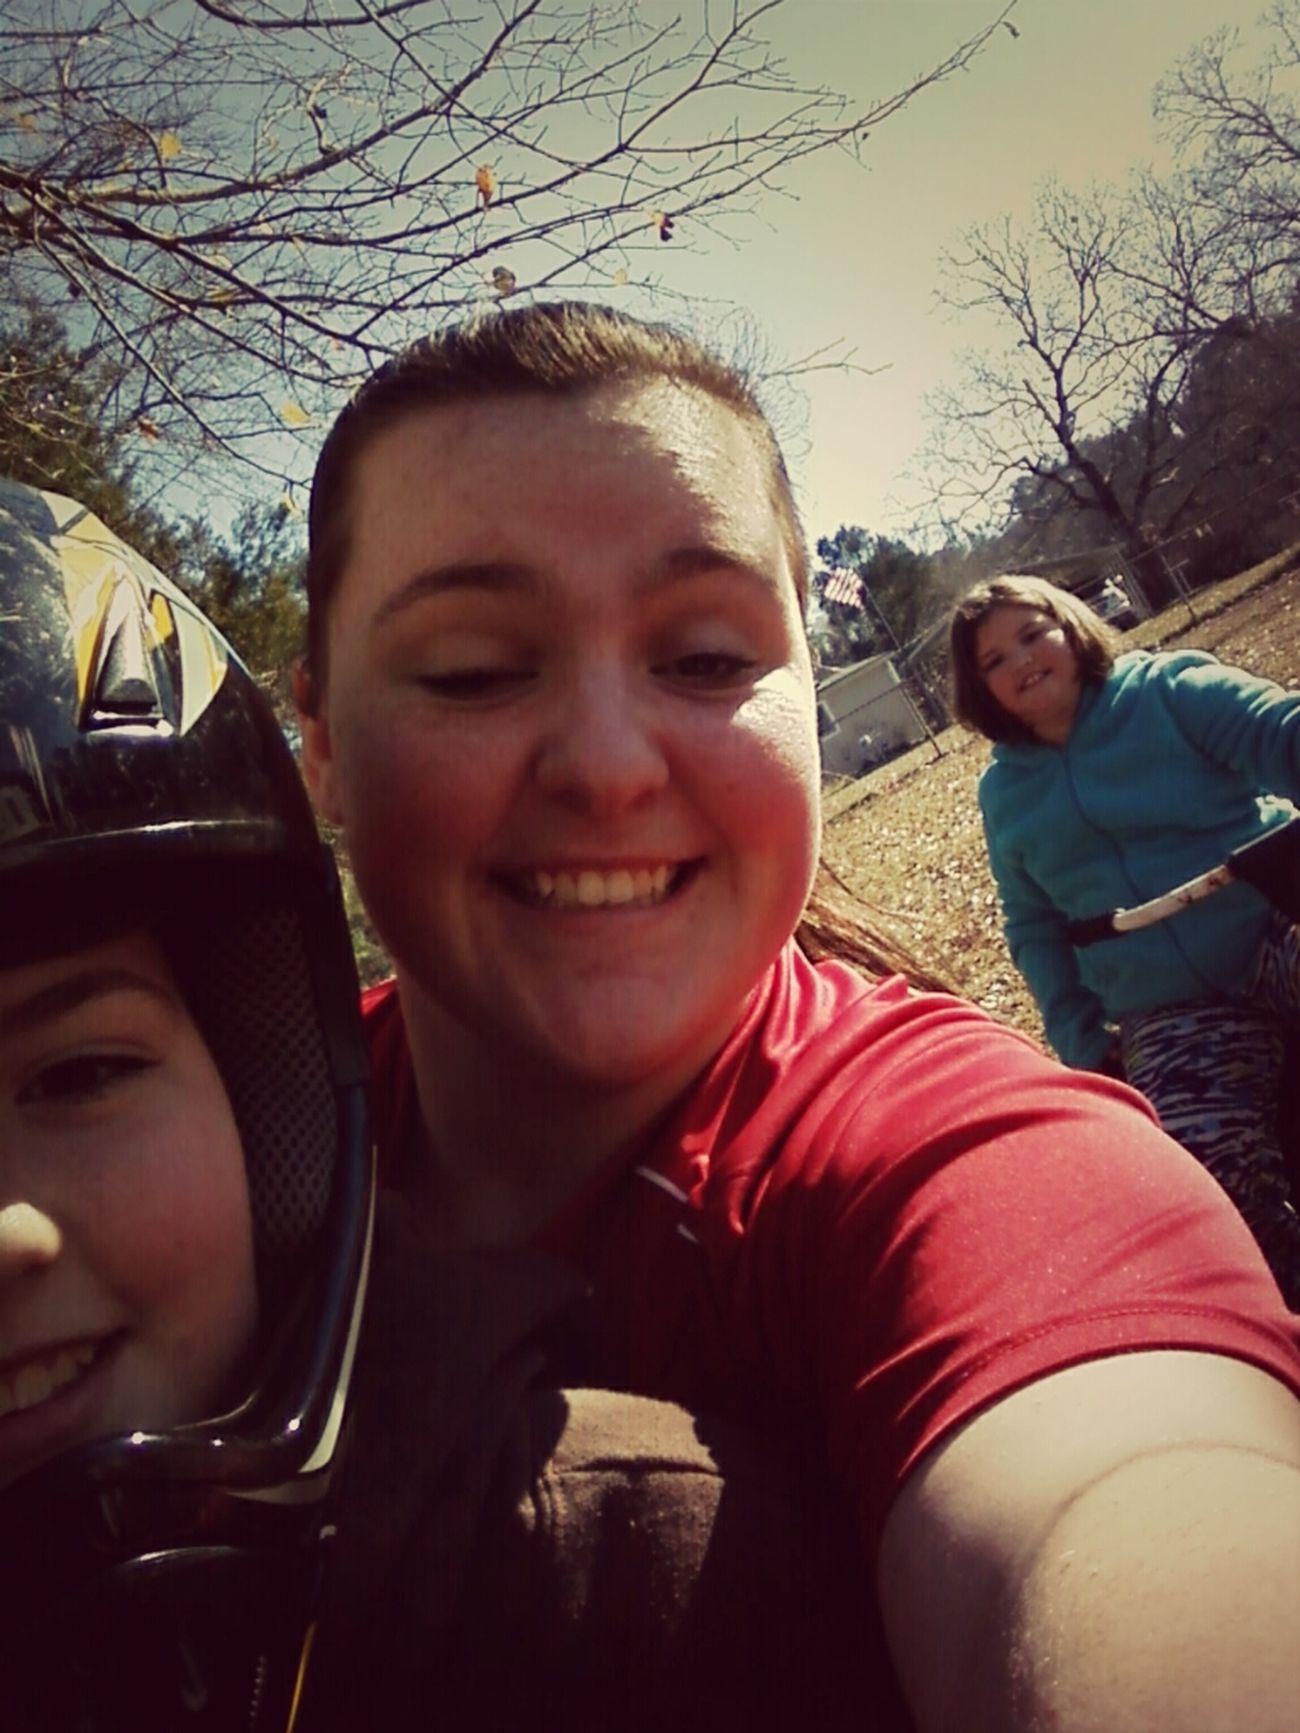 Riding The Wheerler